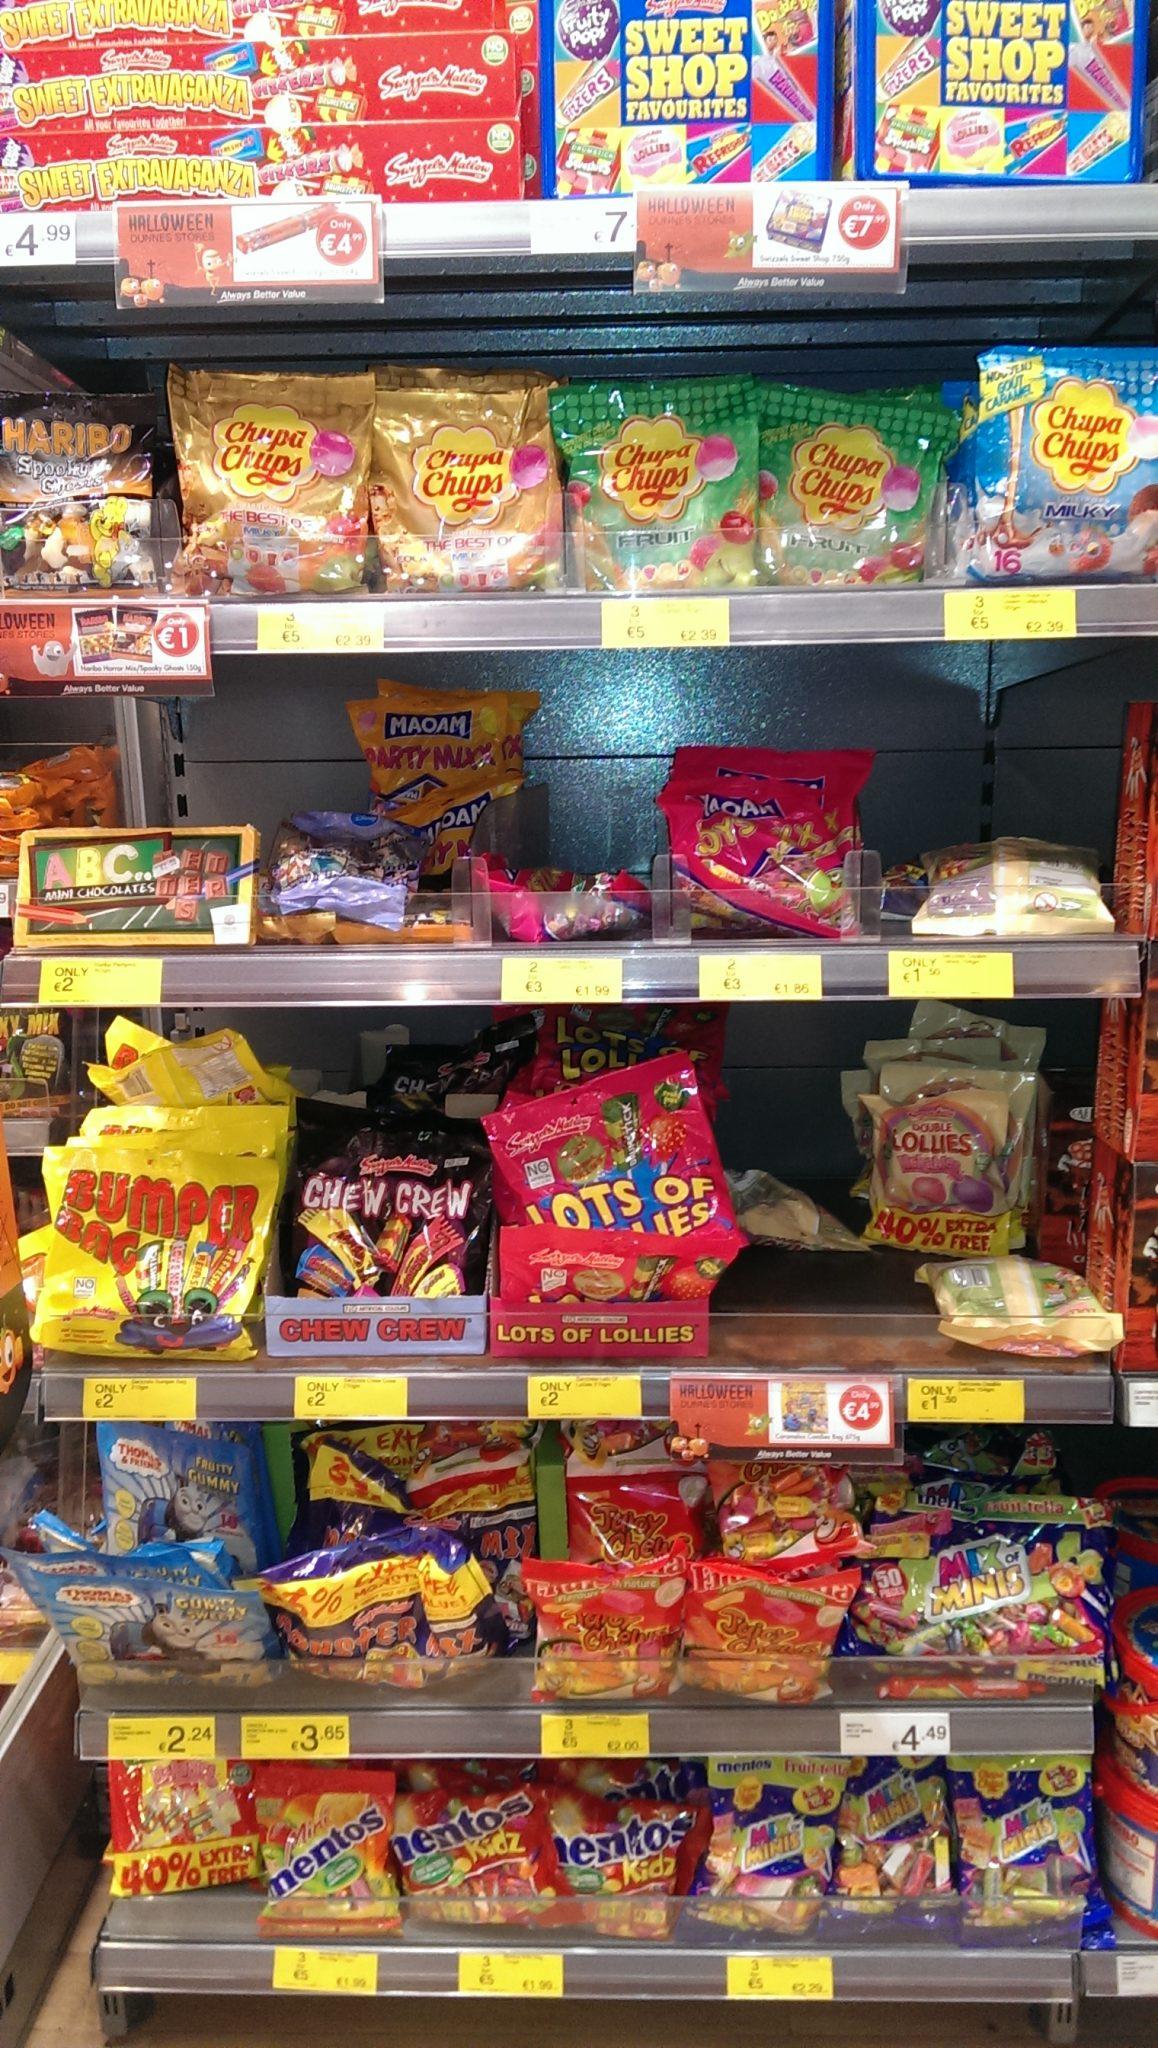 Halloween Shelf in my local supermarket